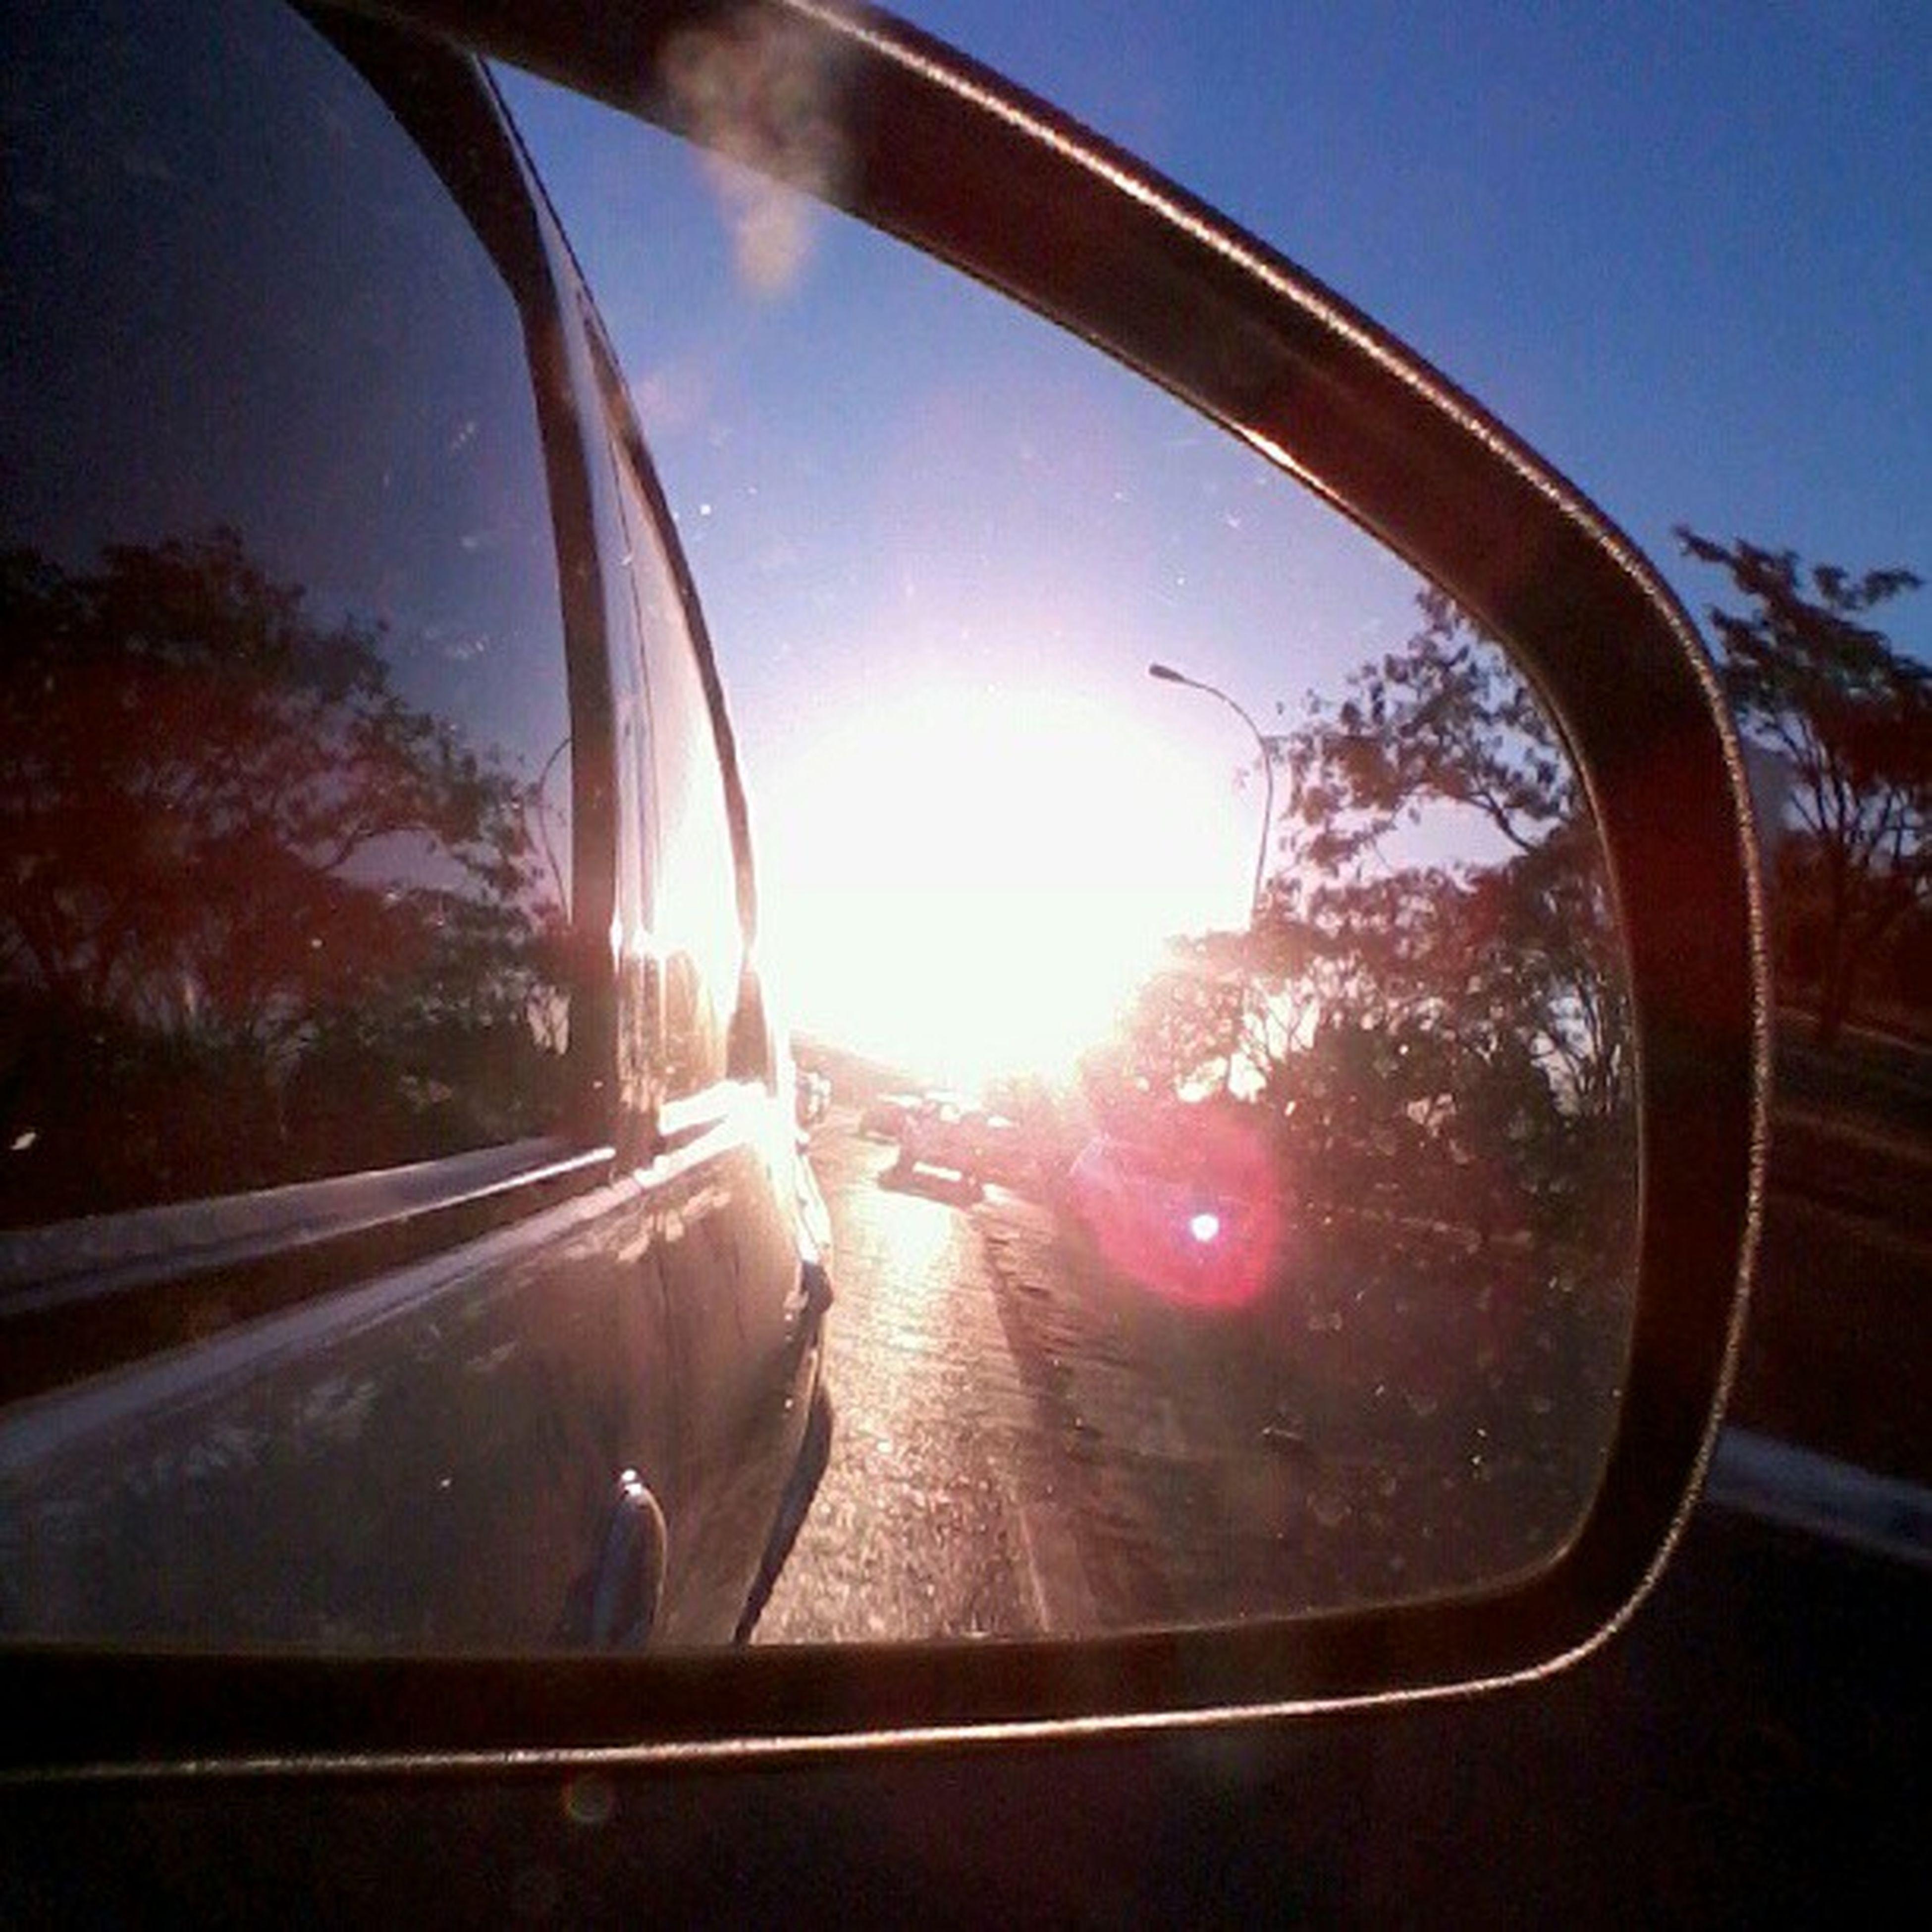 transportation, car, glass - material, transparent, mode of transport, land vehicle, vehicle interior, side-view mirror, car interior, sun, windshield, road, window, tree, reflection, sunlight, sky, sunbeam, lens flare, travel